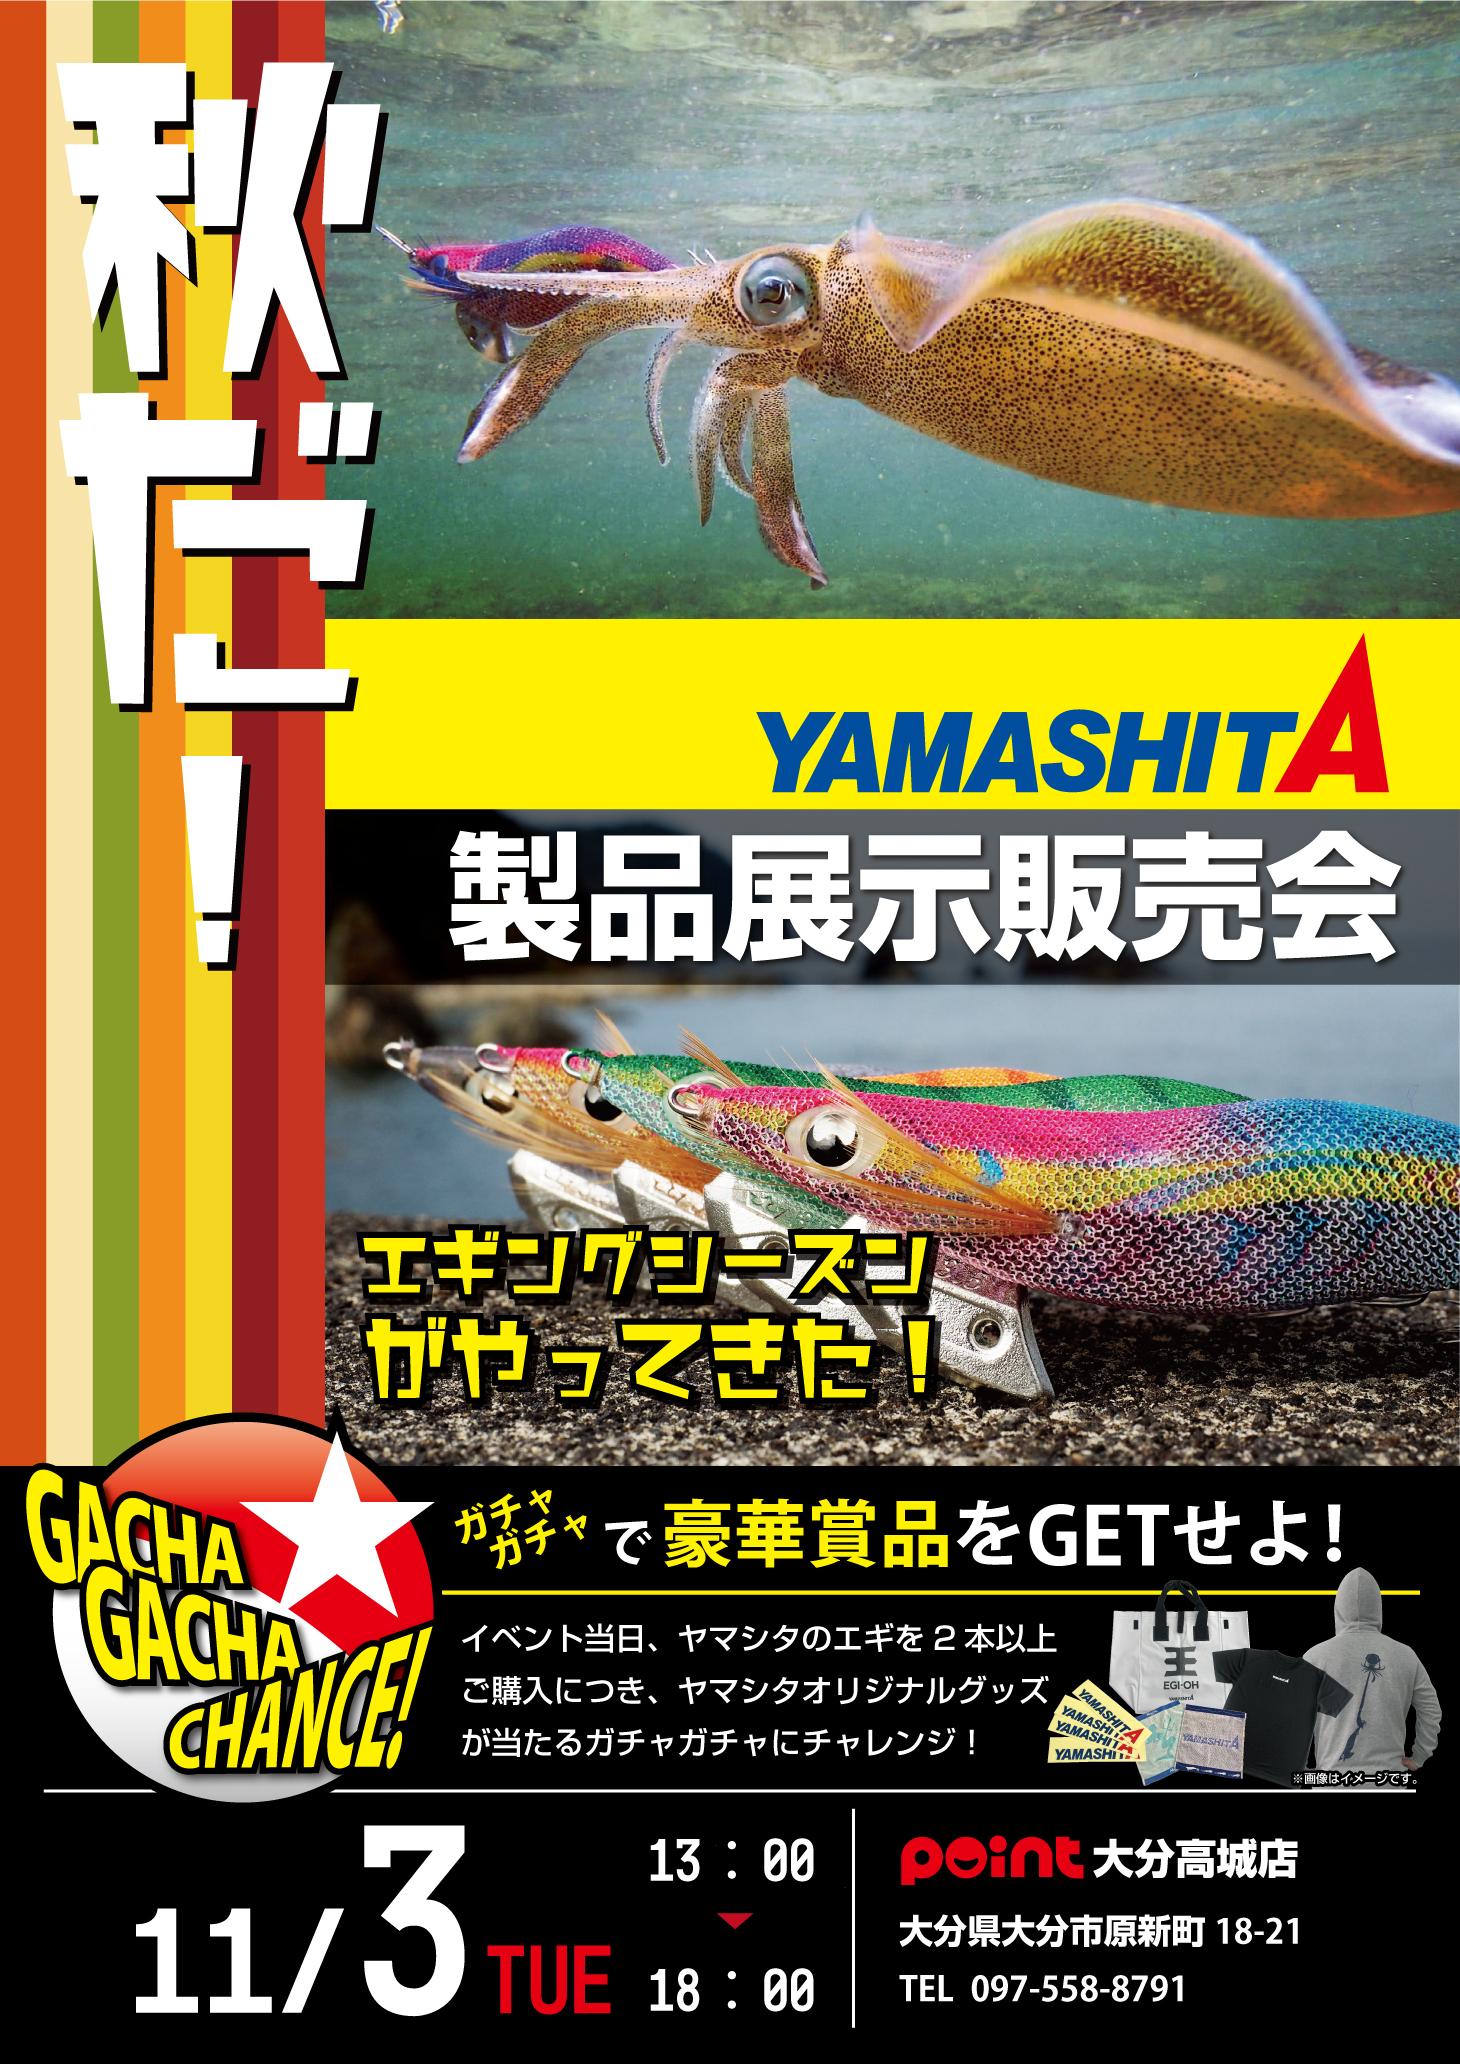 Yamashita製品展示受注会 大分高城